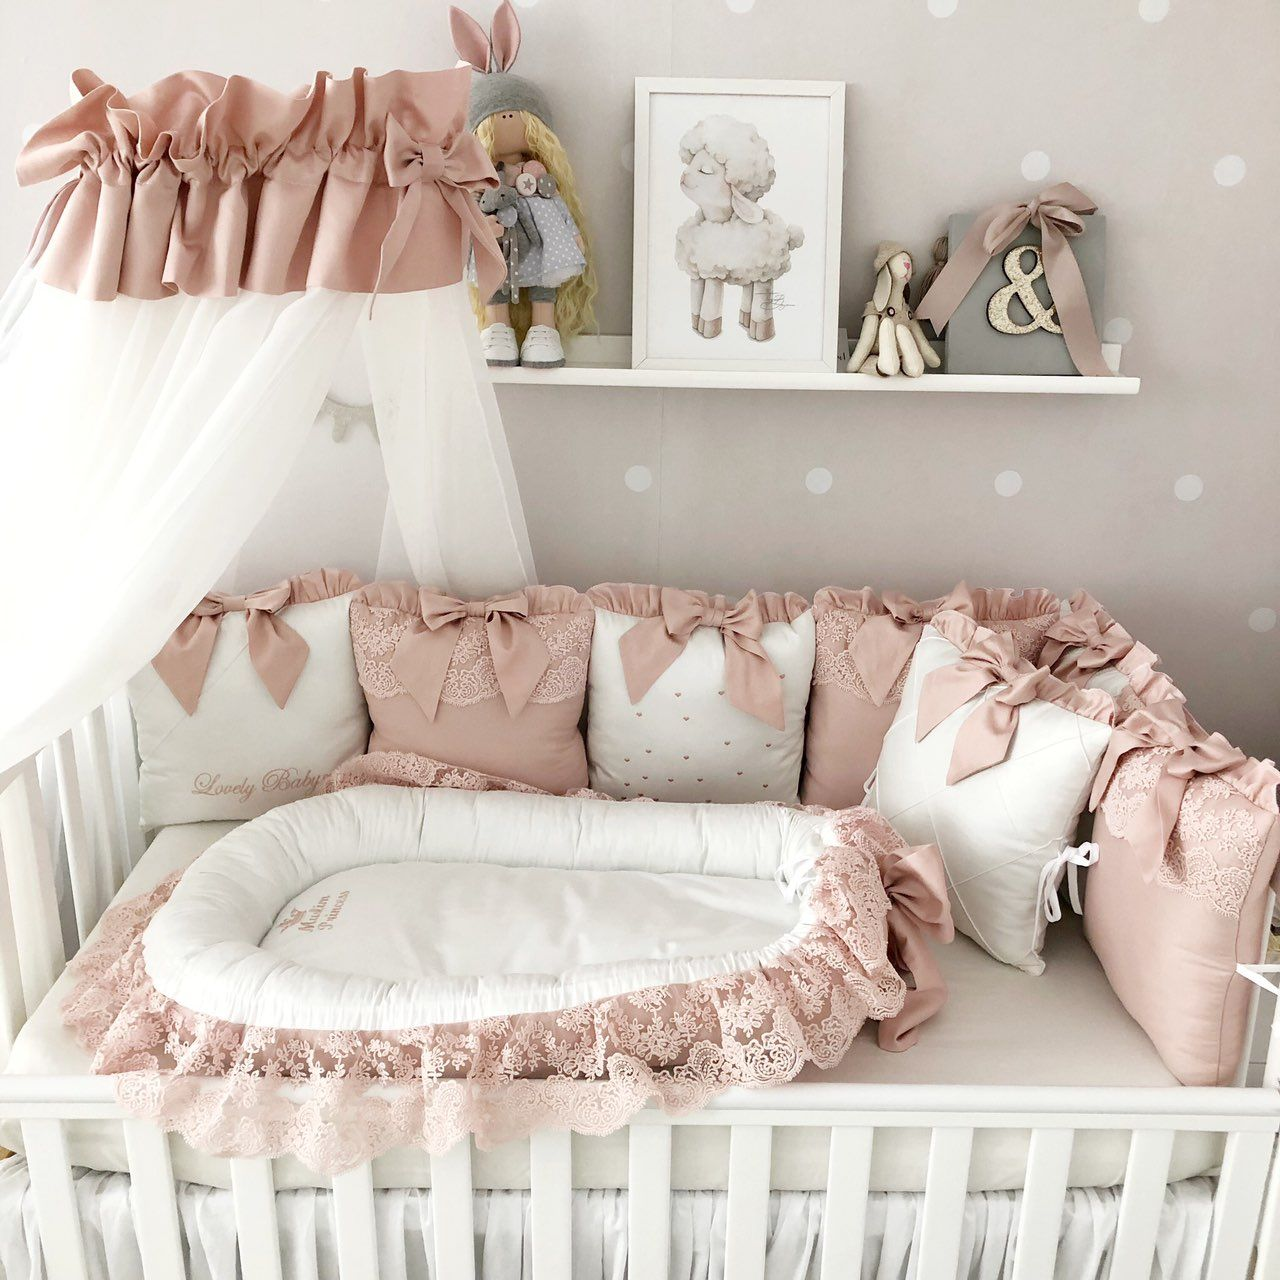 baby girl crib bedding set Crib Bedding Set Baby bumper and crib set Baby Crib Bumper Crib bumber pads with crib sheet